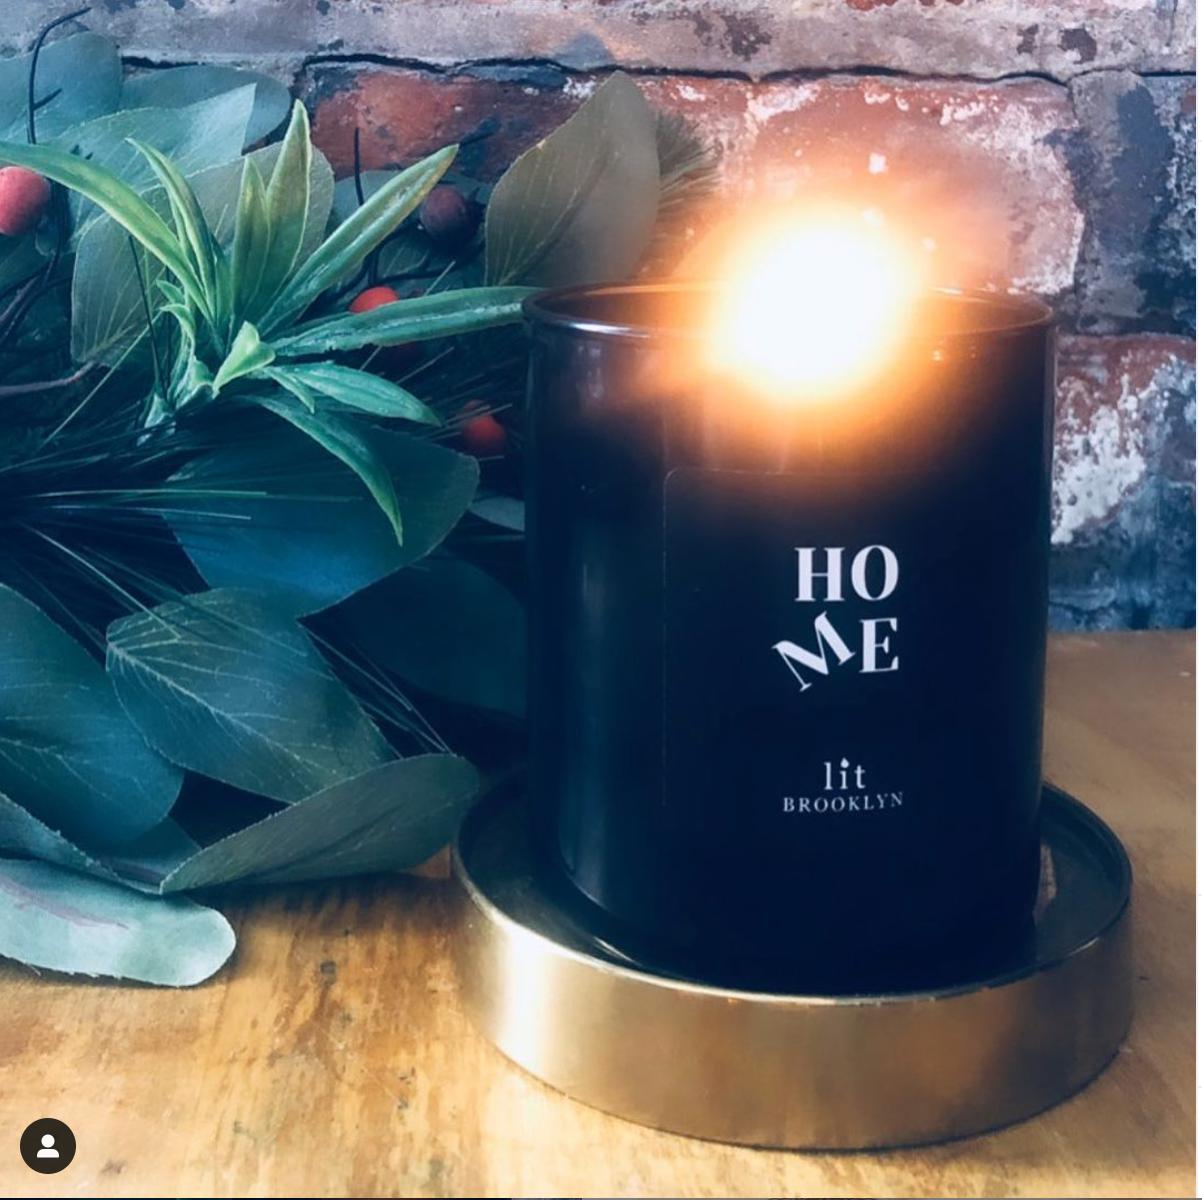 Lit Brooklyn Candles